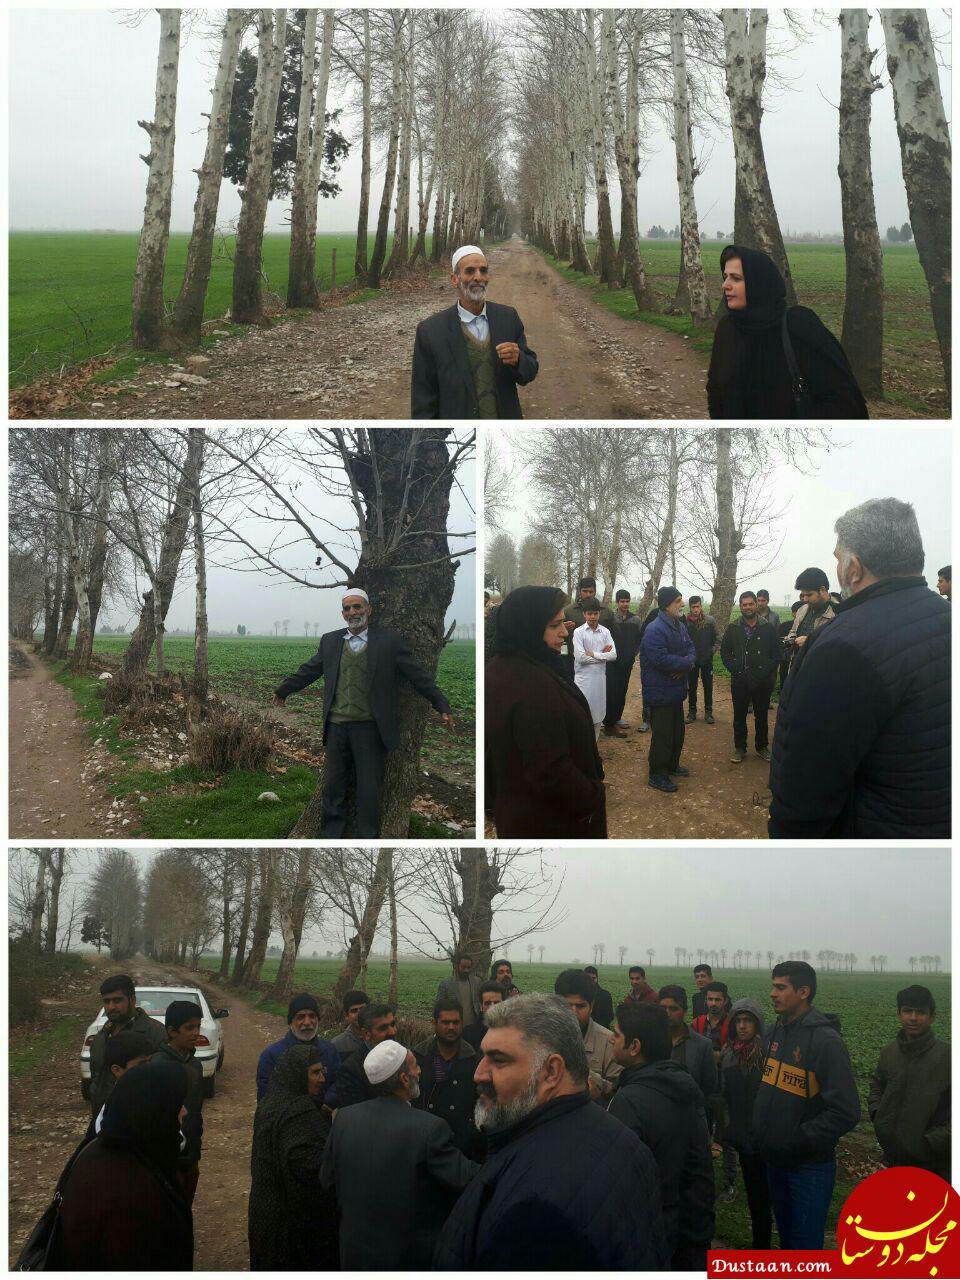 www.dustaan.com مردم روستای «شرکت صحرا» مانع قطع درختان شدند! +عکس